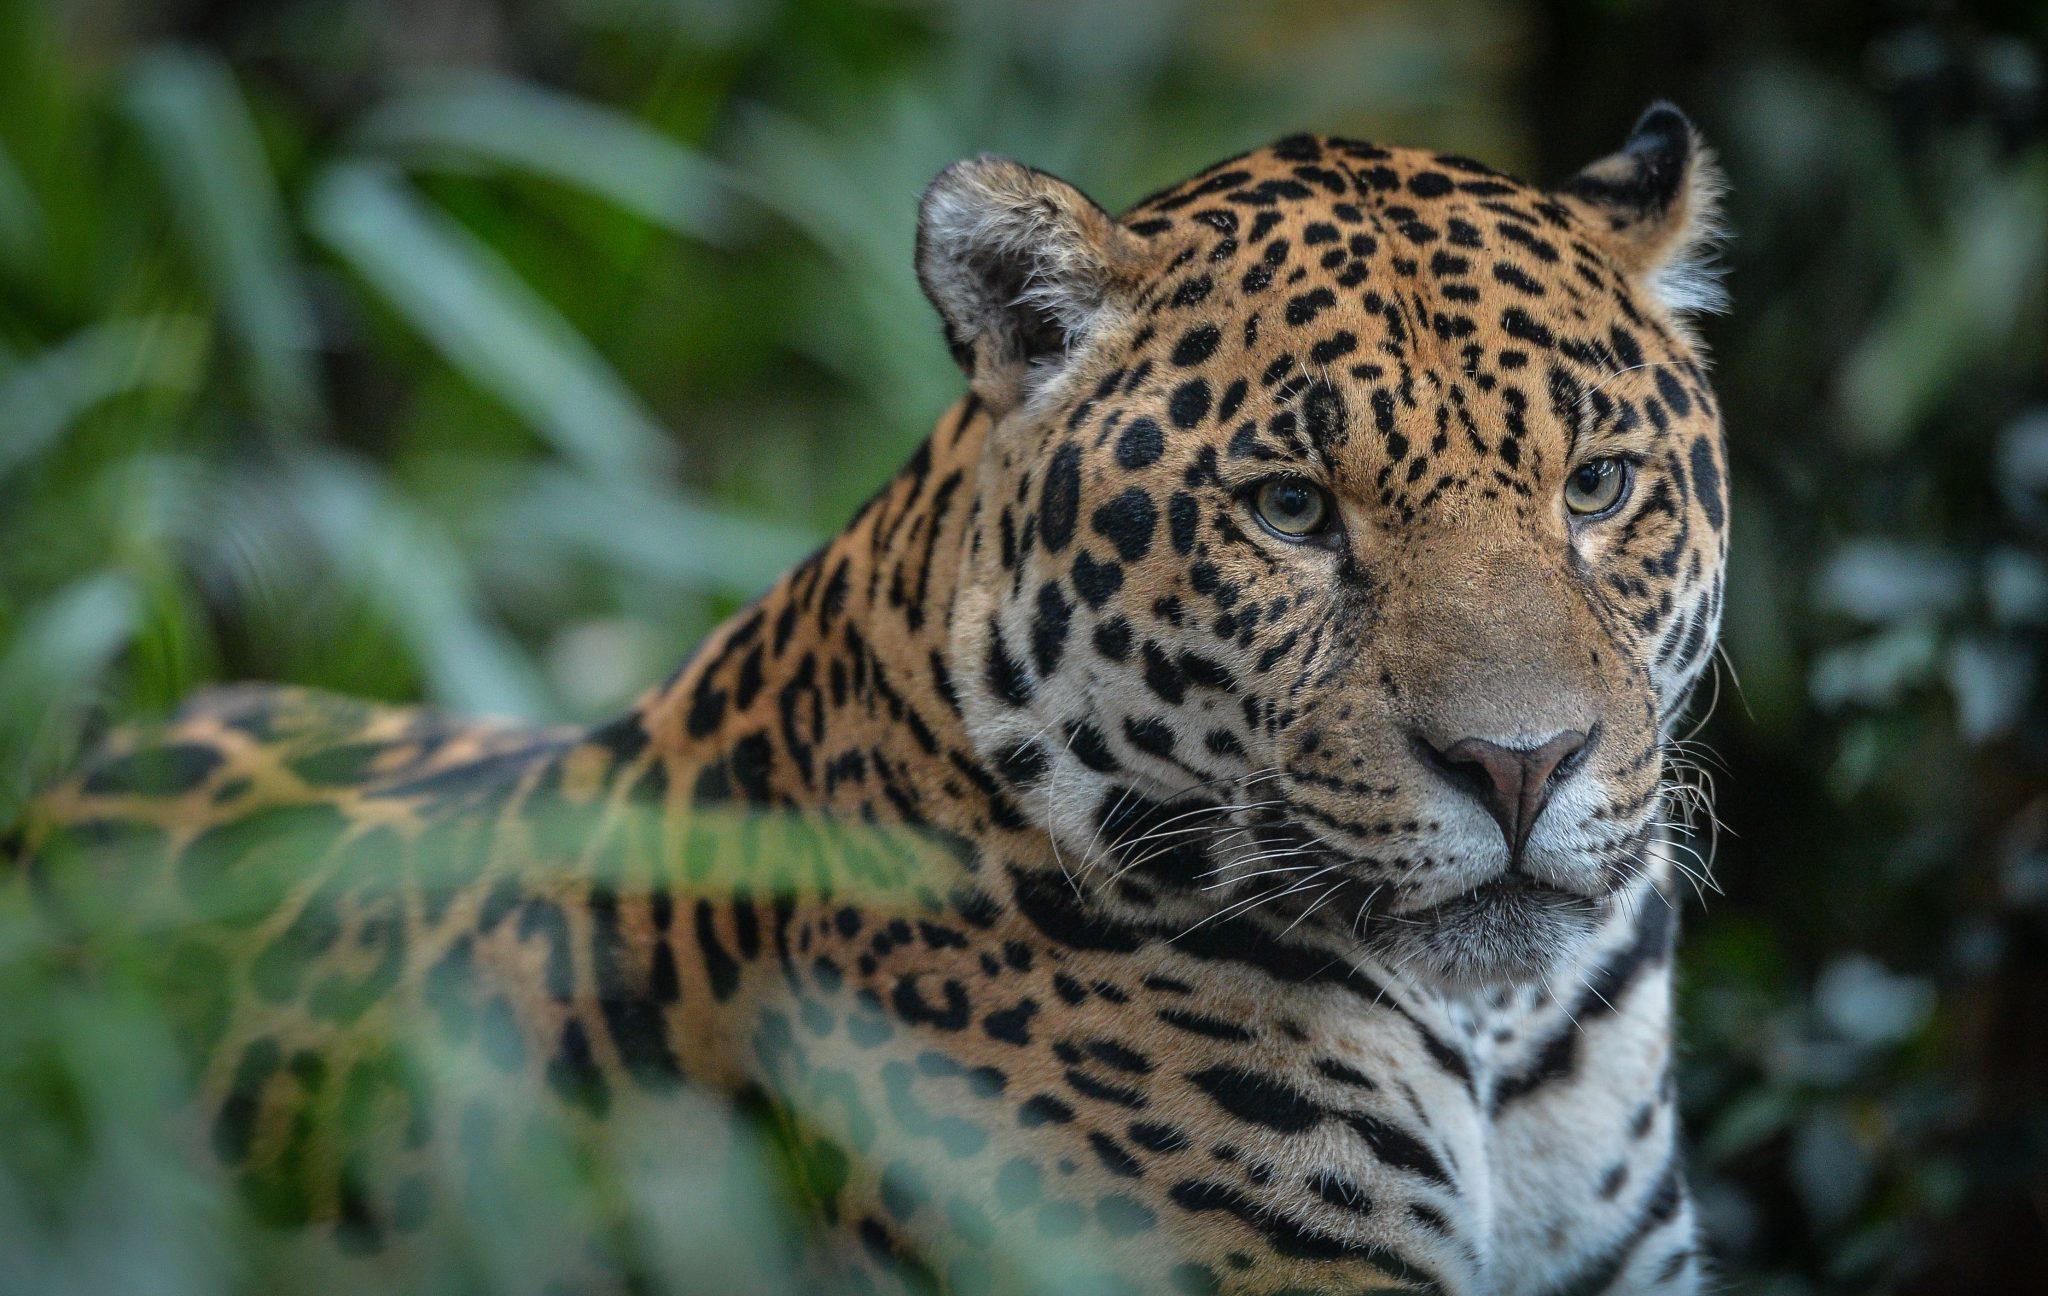 Close up of jaguar at Chester Zoo